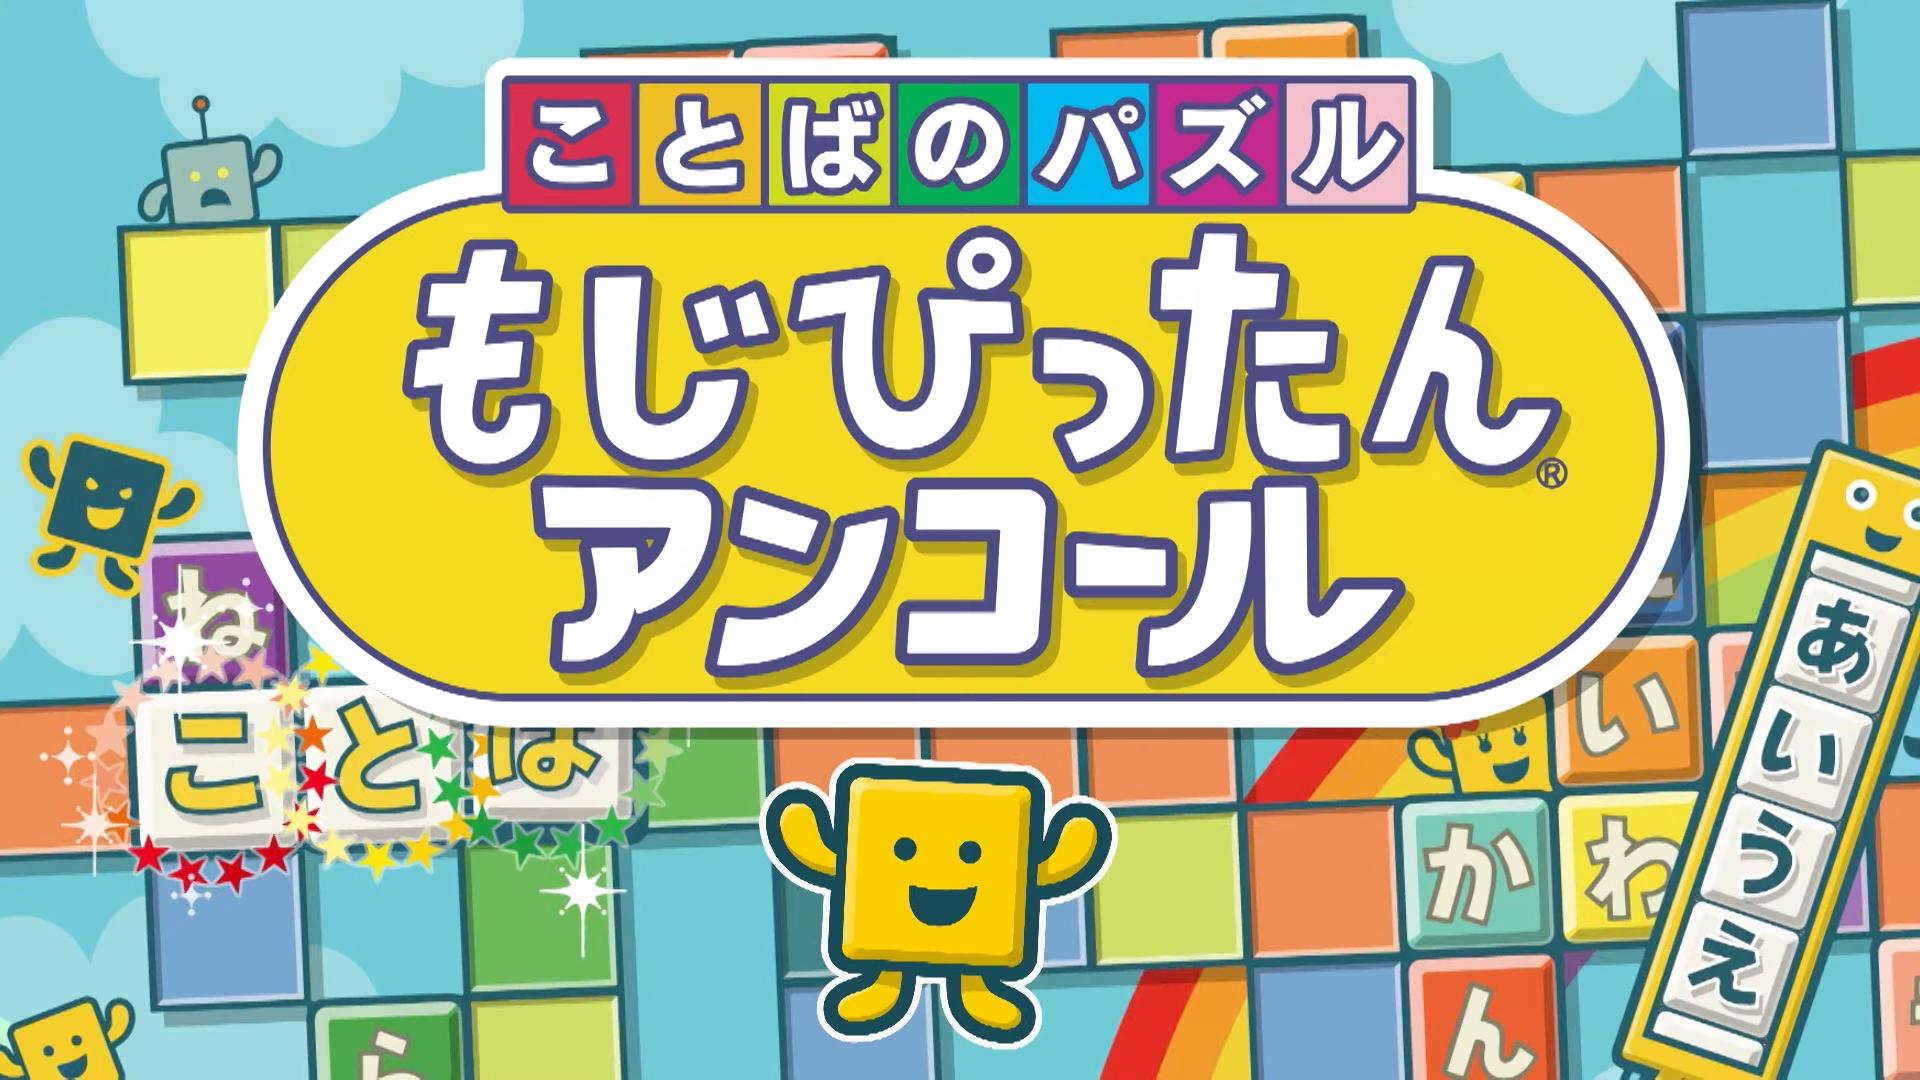 [Switch] Jogo de puzzle arcade Kotoba no Puzzle: Moji Pittan Encore ganha novo trailer